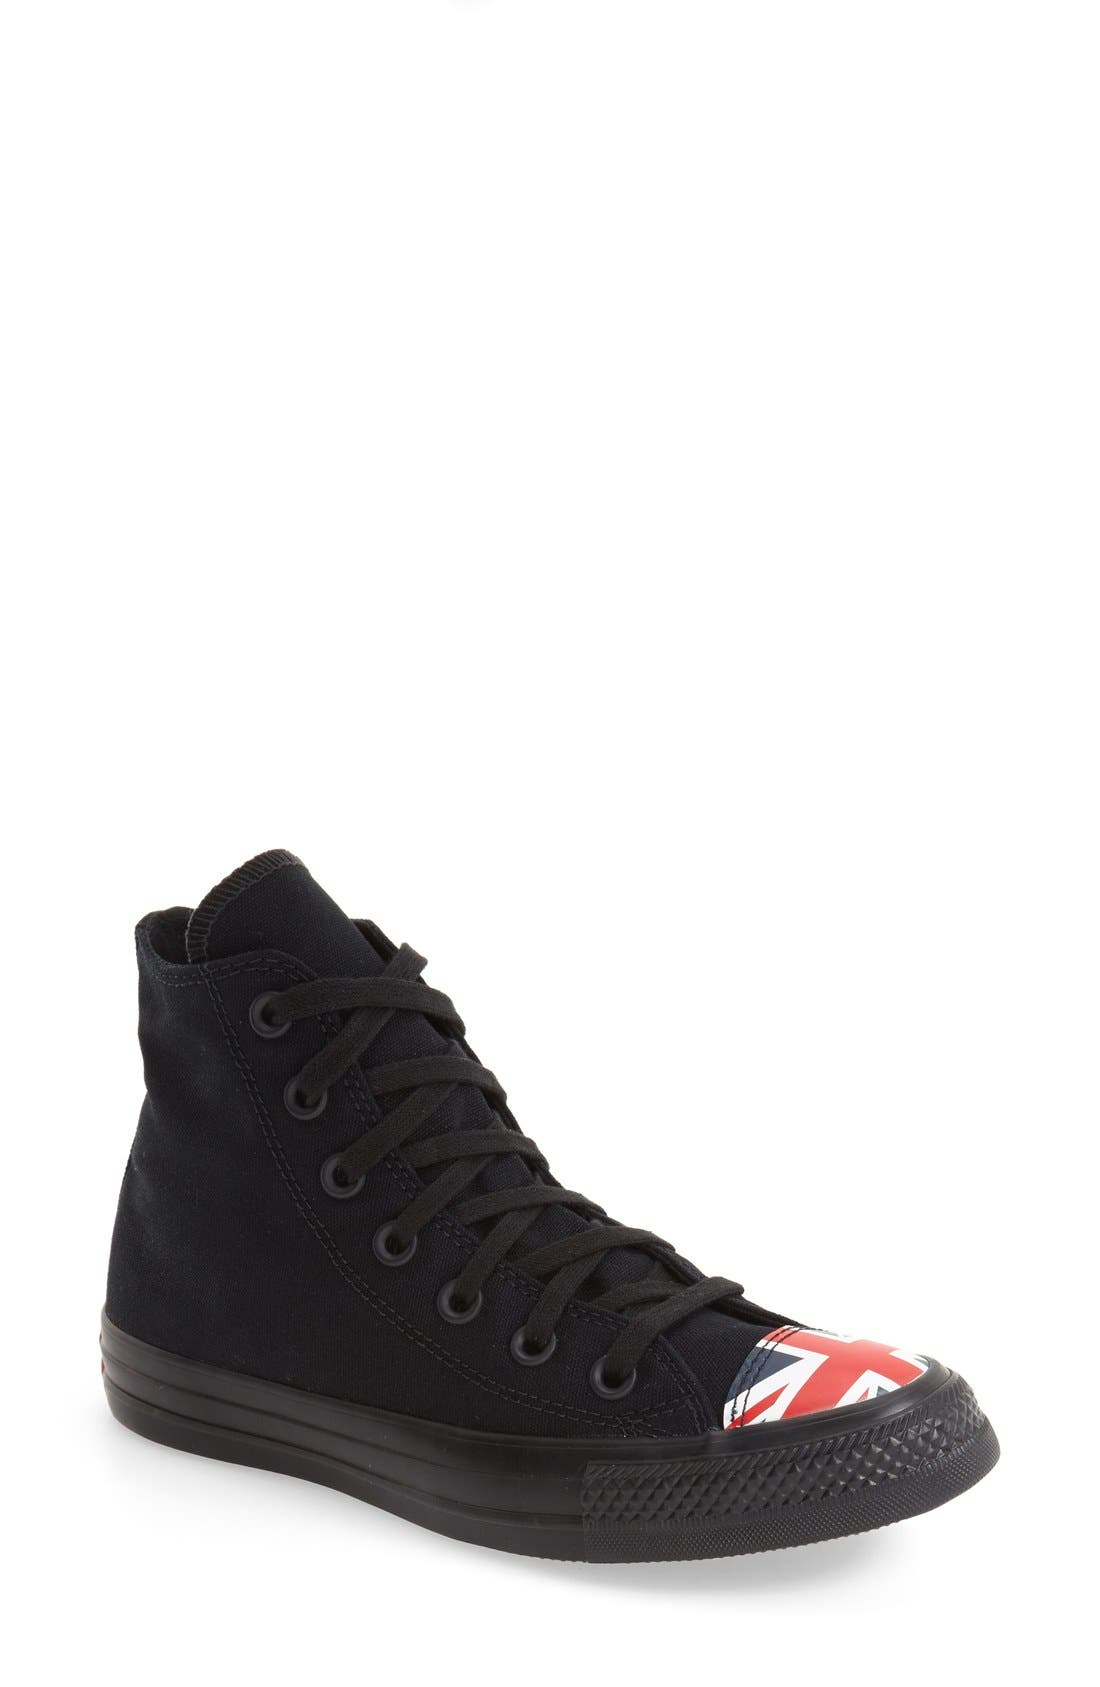 Main Image - Converse Chuck Taylor® All Star® Flag Cap Toe High Top Sneaker (Women)